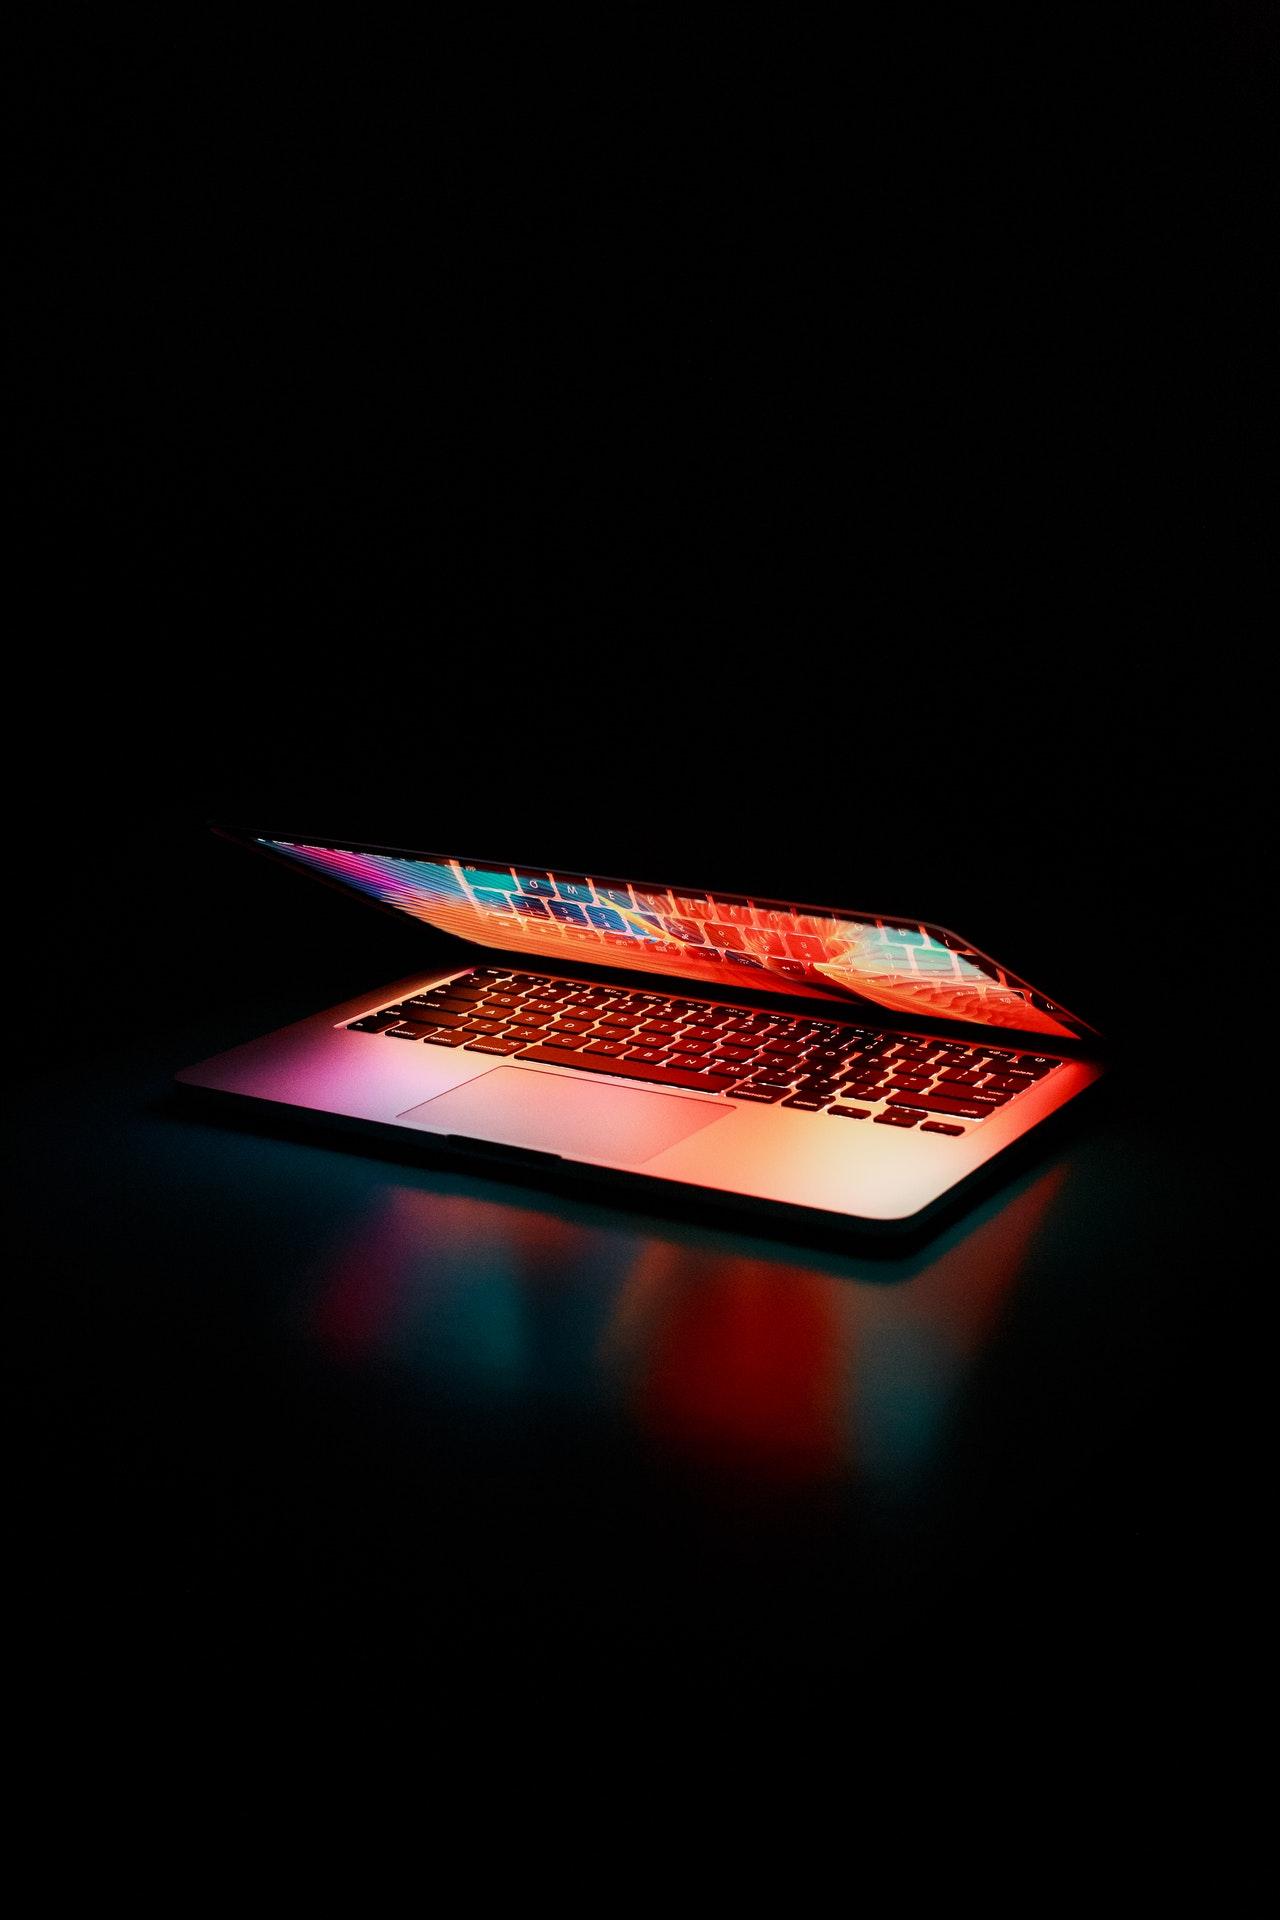 Geheel je eigen laptop samenstellen